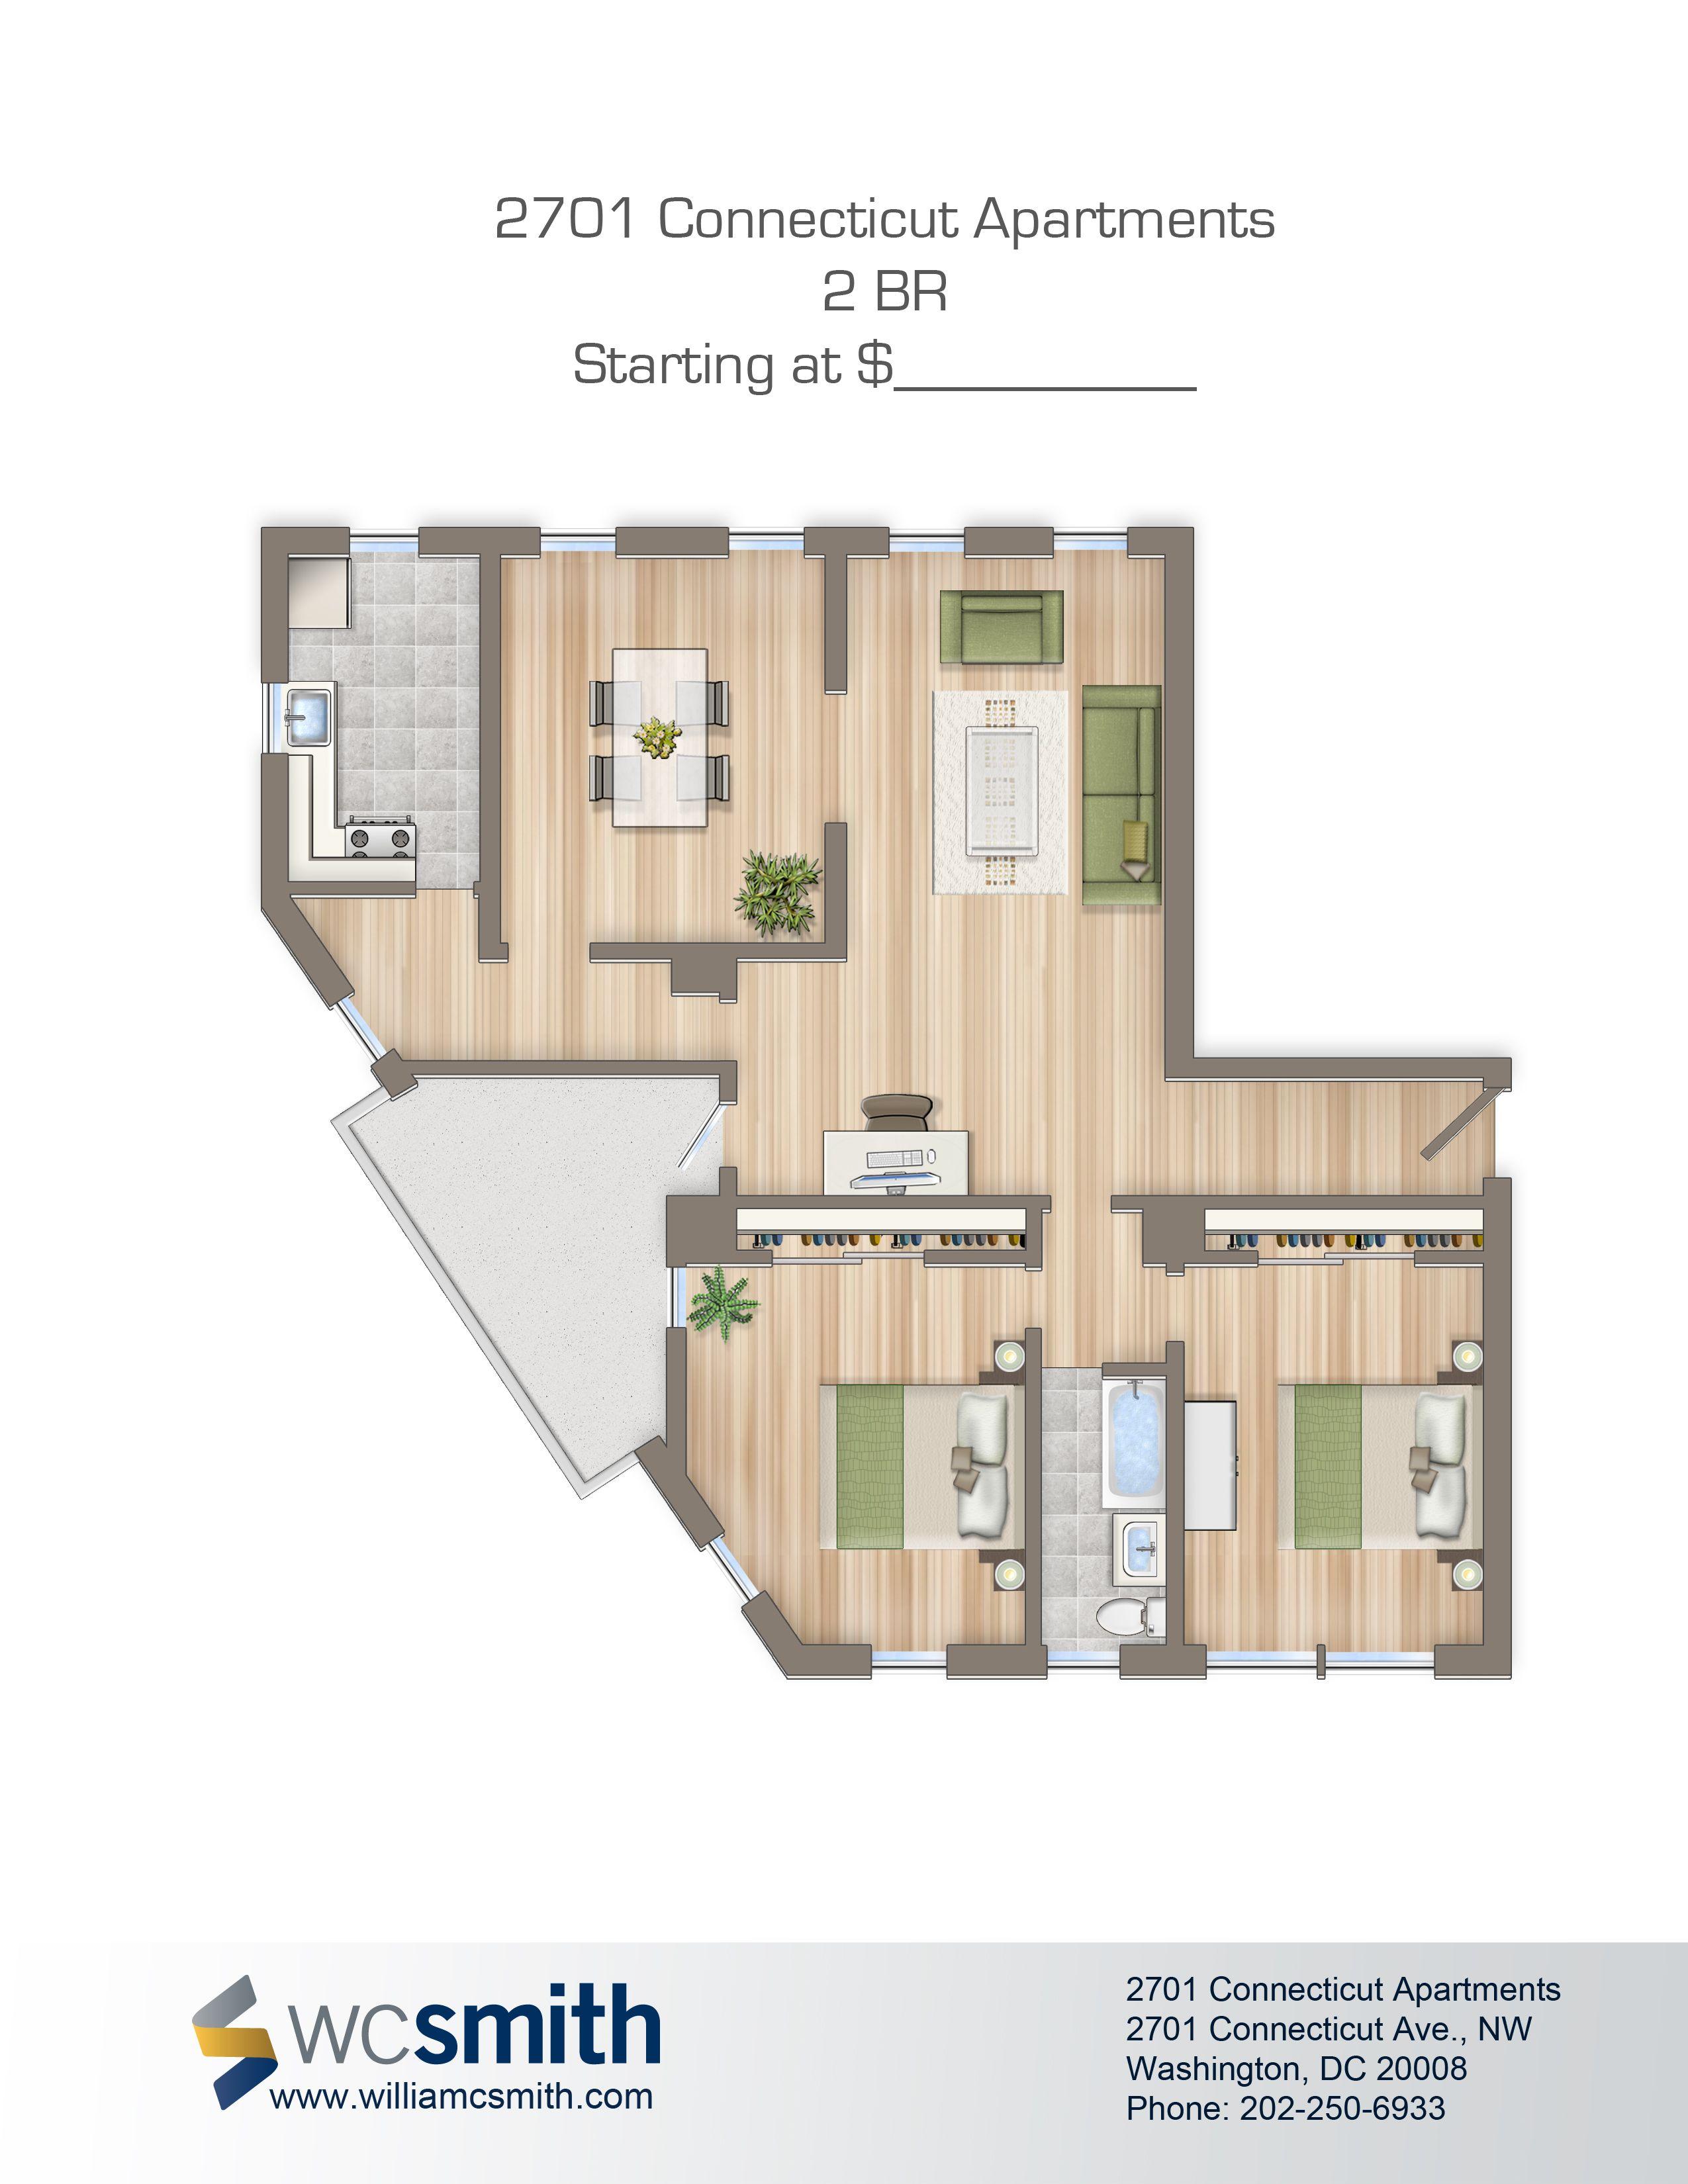 2701 CONN. AVE. N.W 2 bedroom floor plans, Floor plans